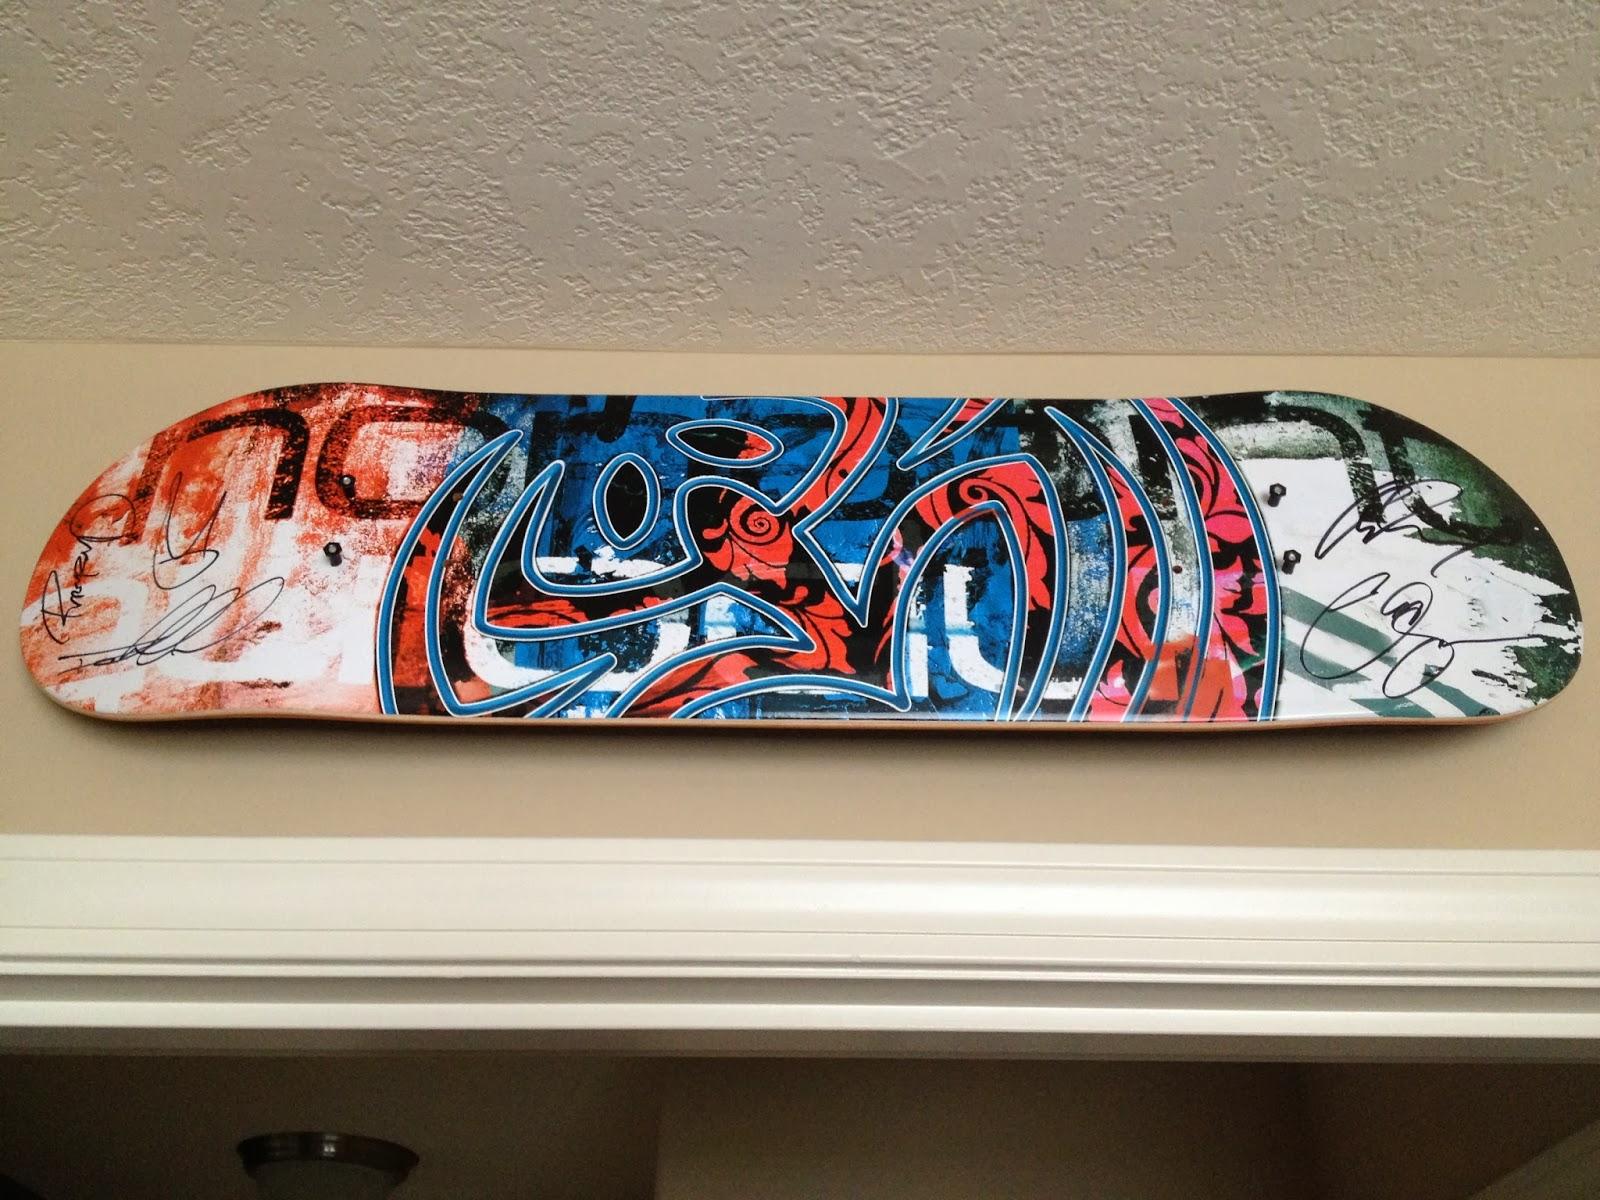 Skateboard Wall Mount | Skateboard Deck Art & StoreYourBoard Blog: Skateboard Wall Mount | Skateboard Deck Art